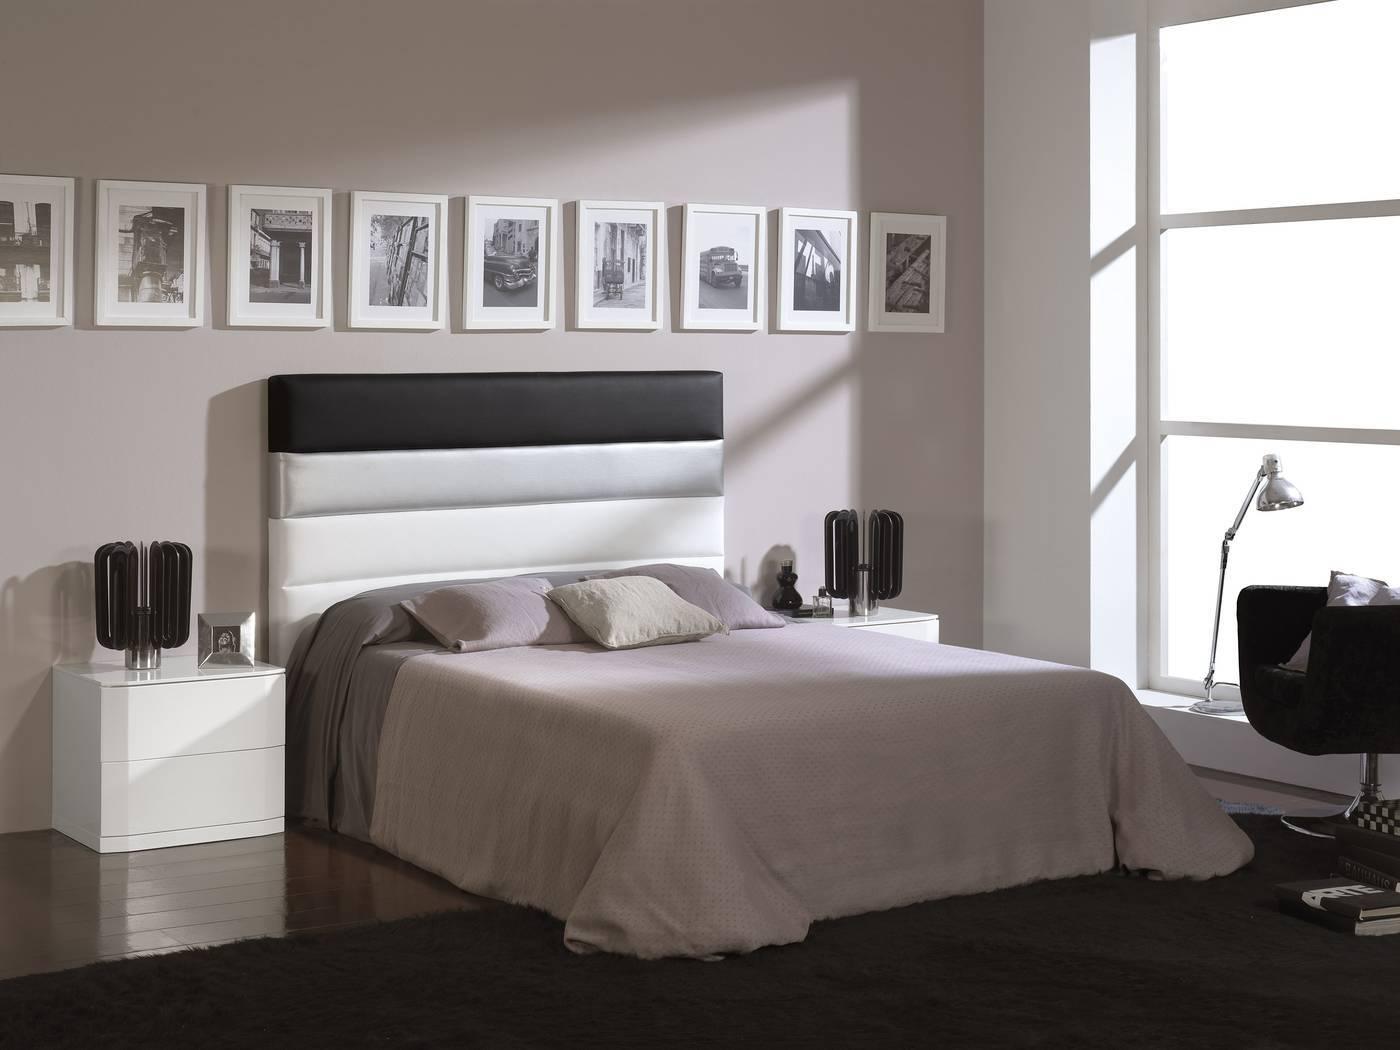 Cabeceros de cama tapizados lamparas sevilla - Cabecero de cama ...